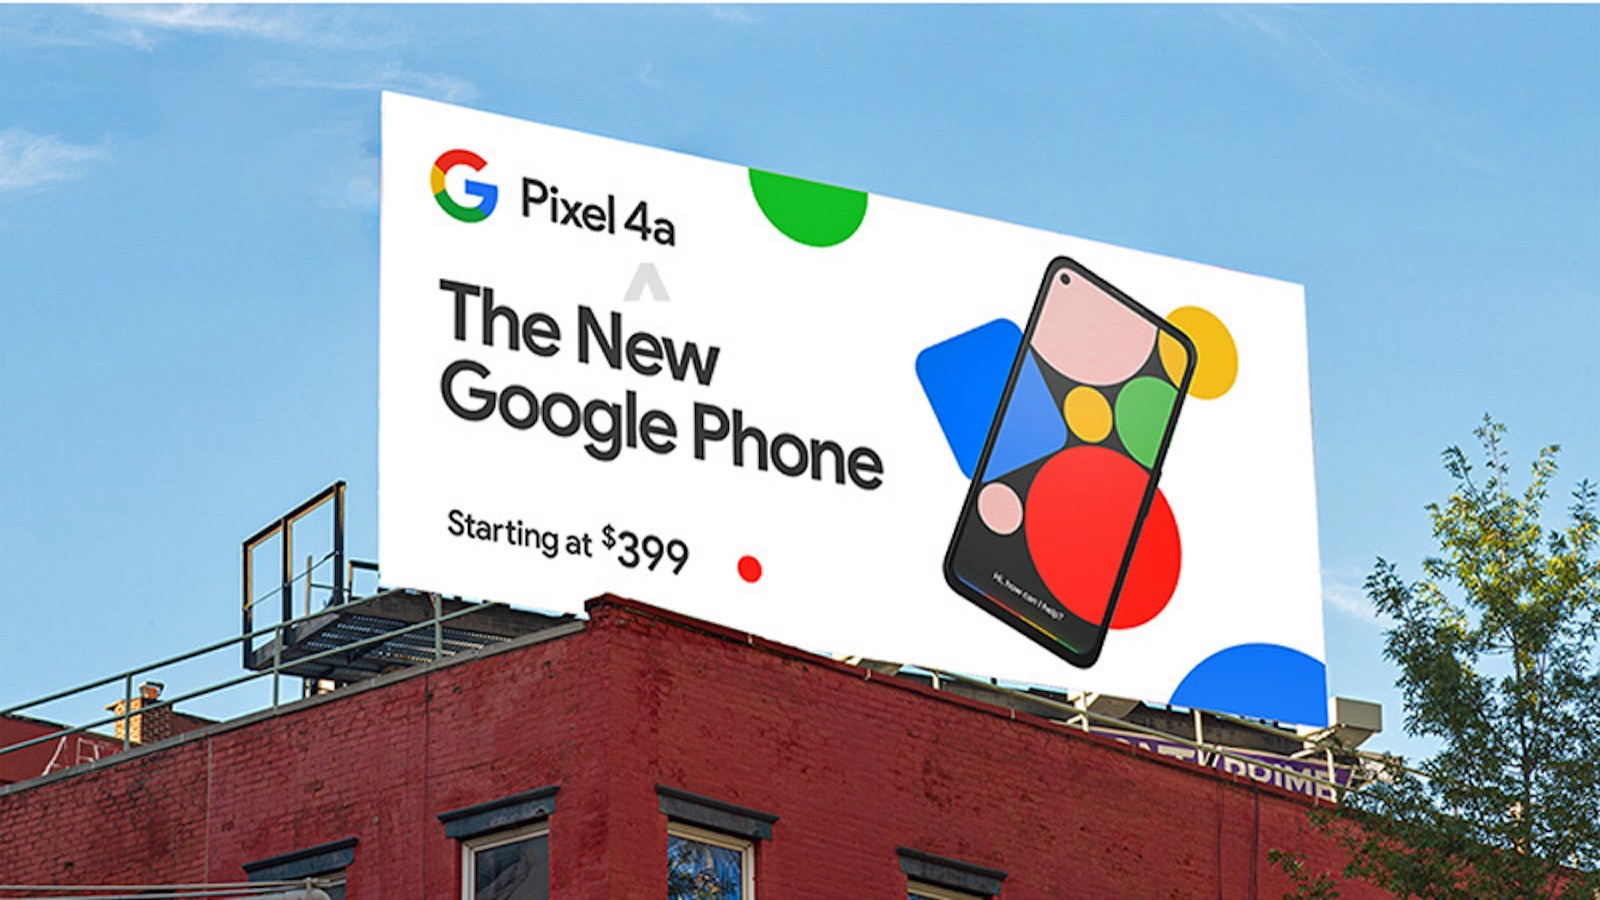 Pixel4a-price-is-399-2.jpeg